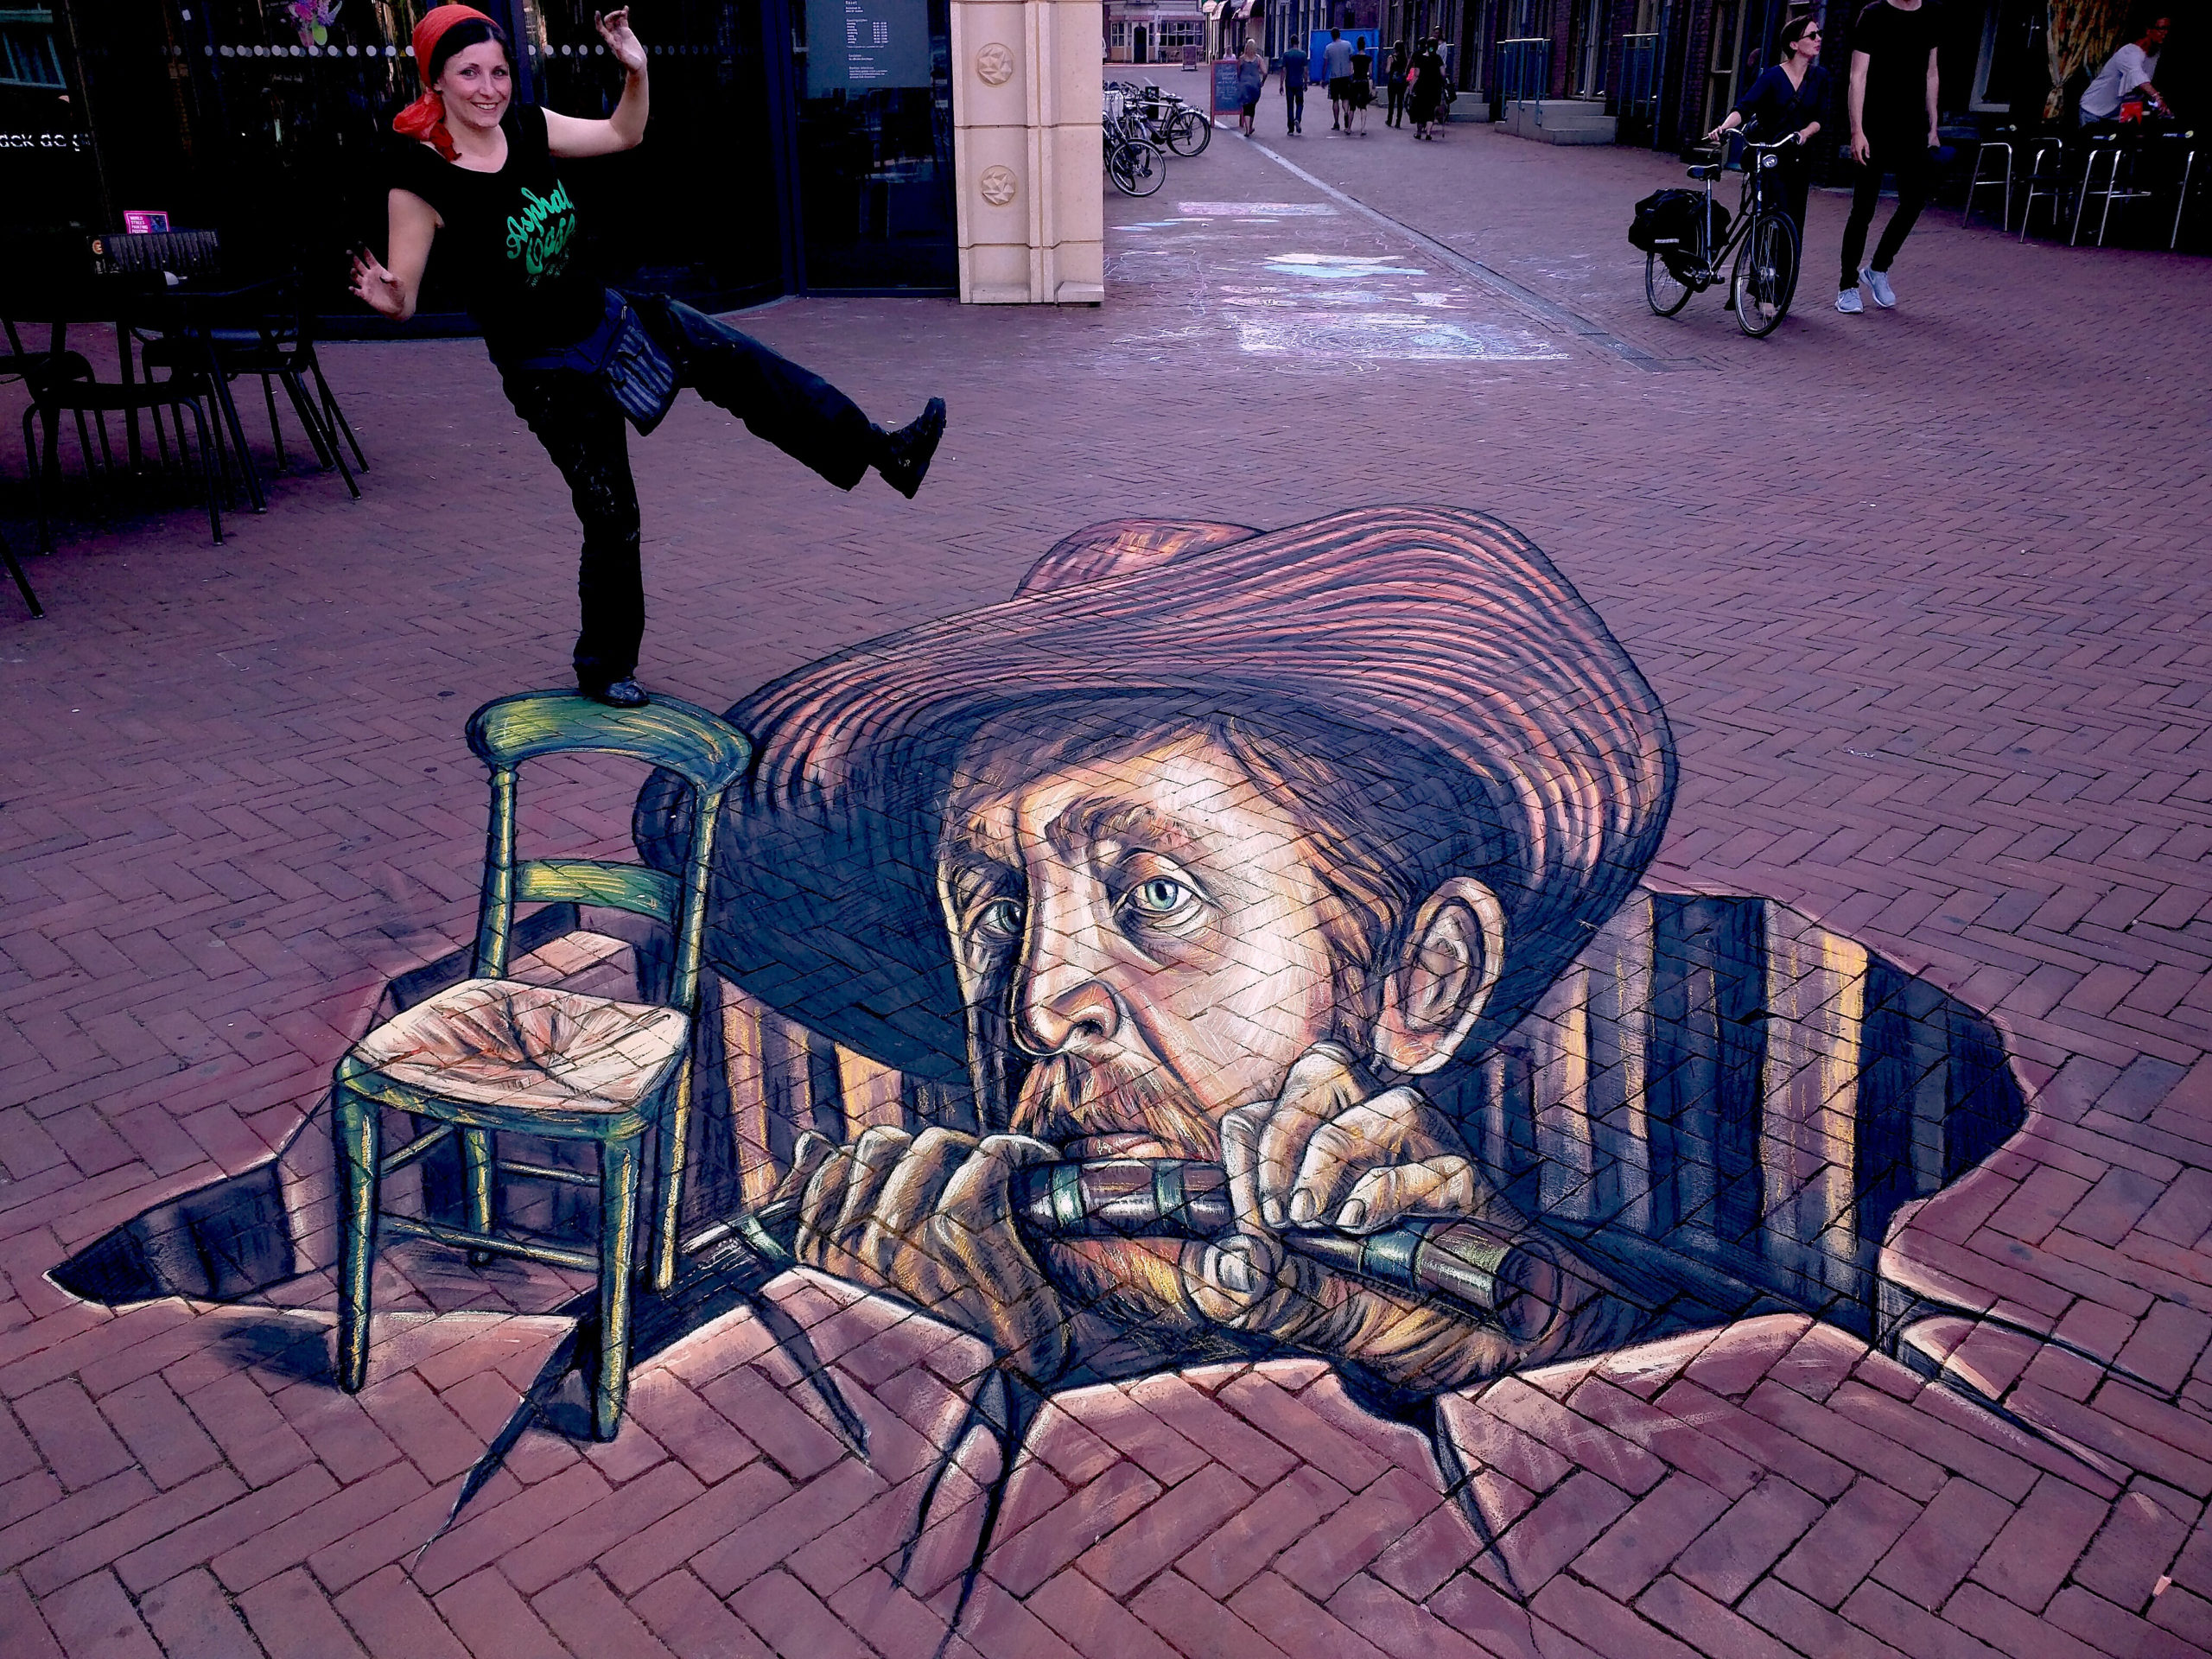 verabugatti streetart arteurbana illusioniottiche 3Dstreetart anamorfosi anamorfico anamorphic illusions urbanart madonnari3D pavementart 3Dstreetart 3Dstreetpainting environment thereisnotplanetb vangogh arnhem